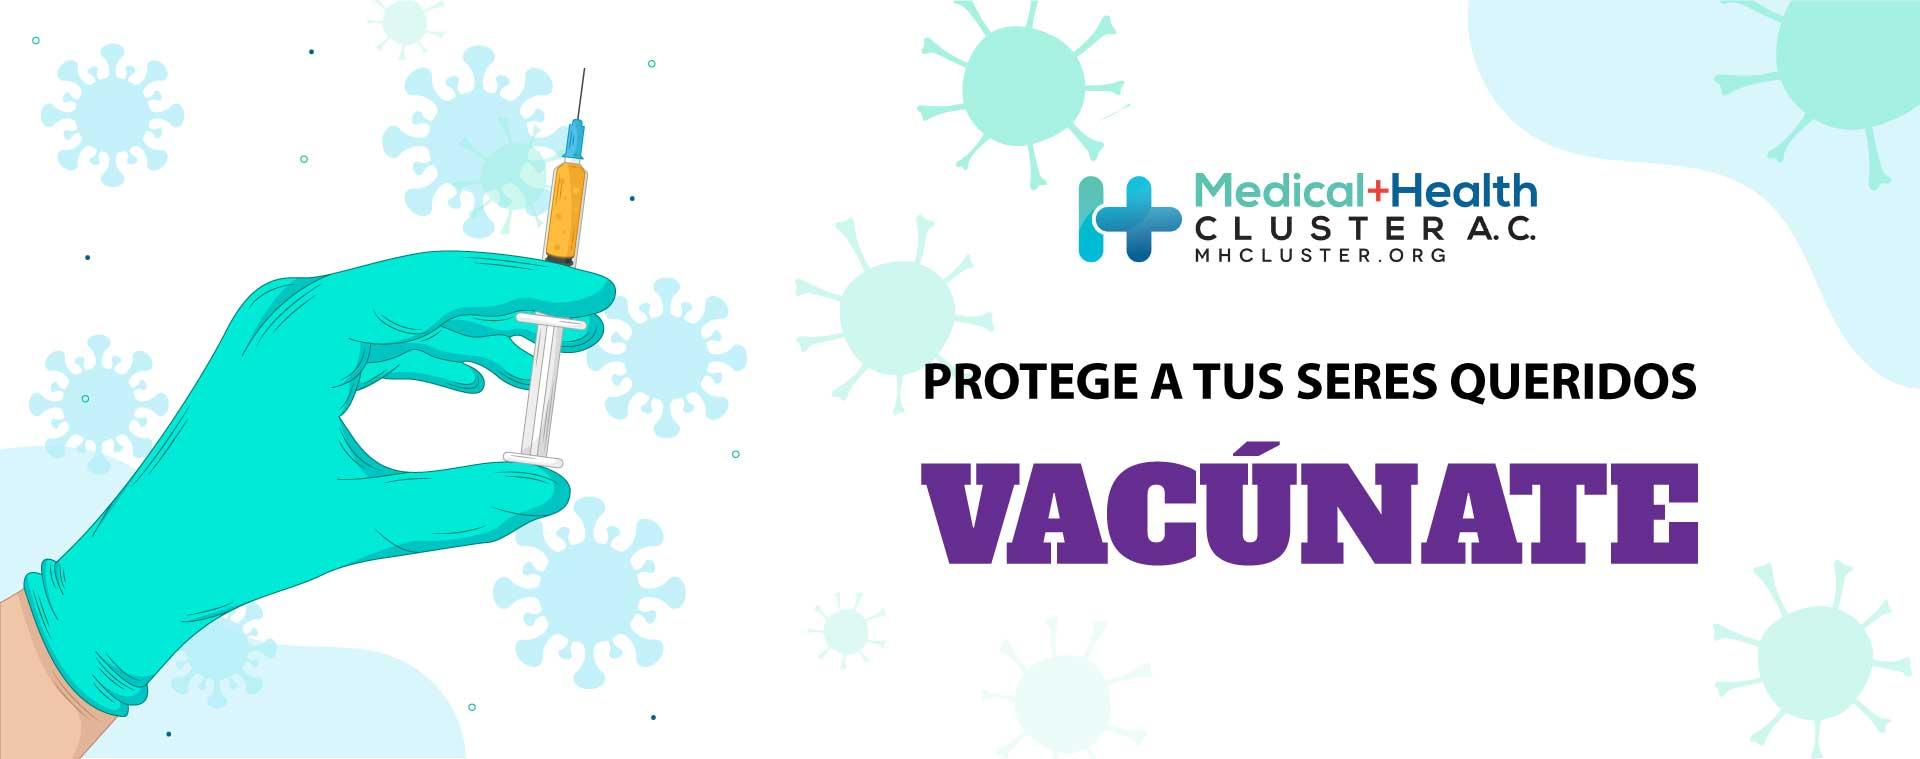 Protege-a-tus-seres-queridos-vacunate